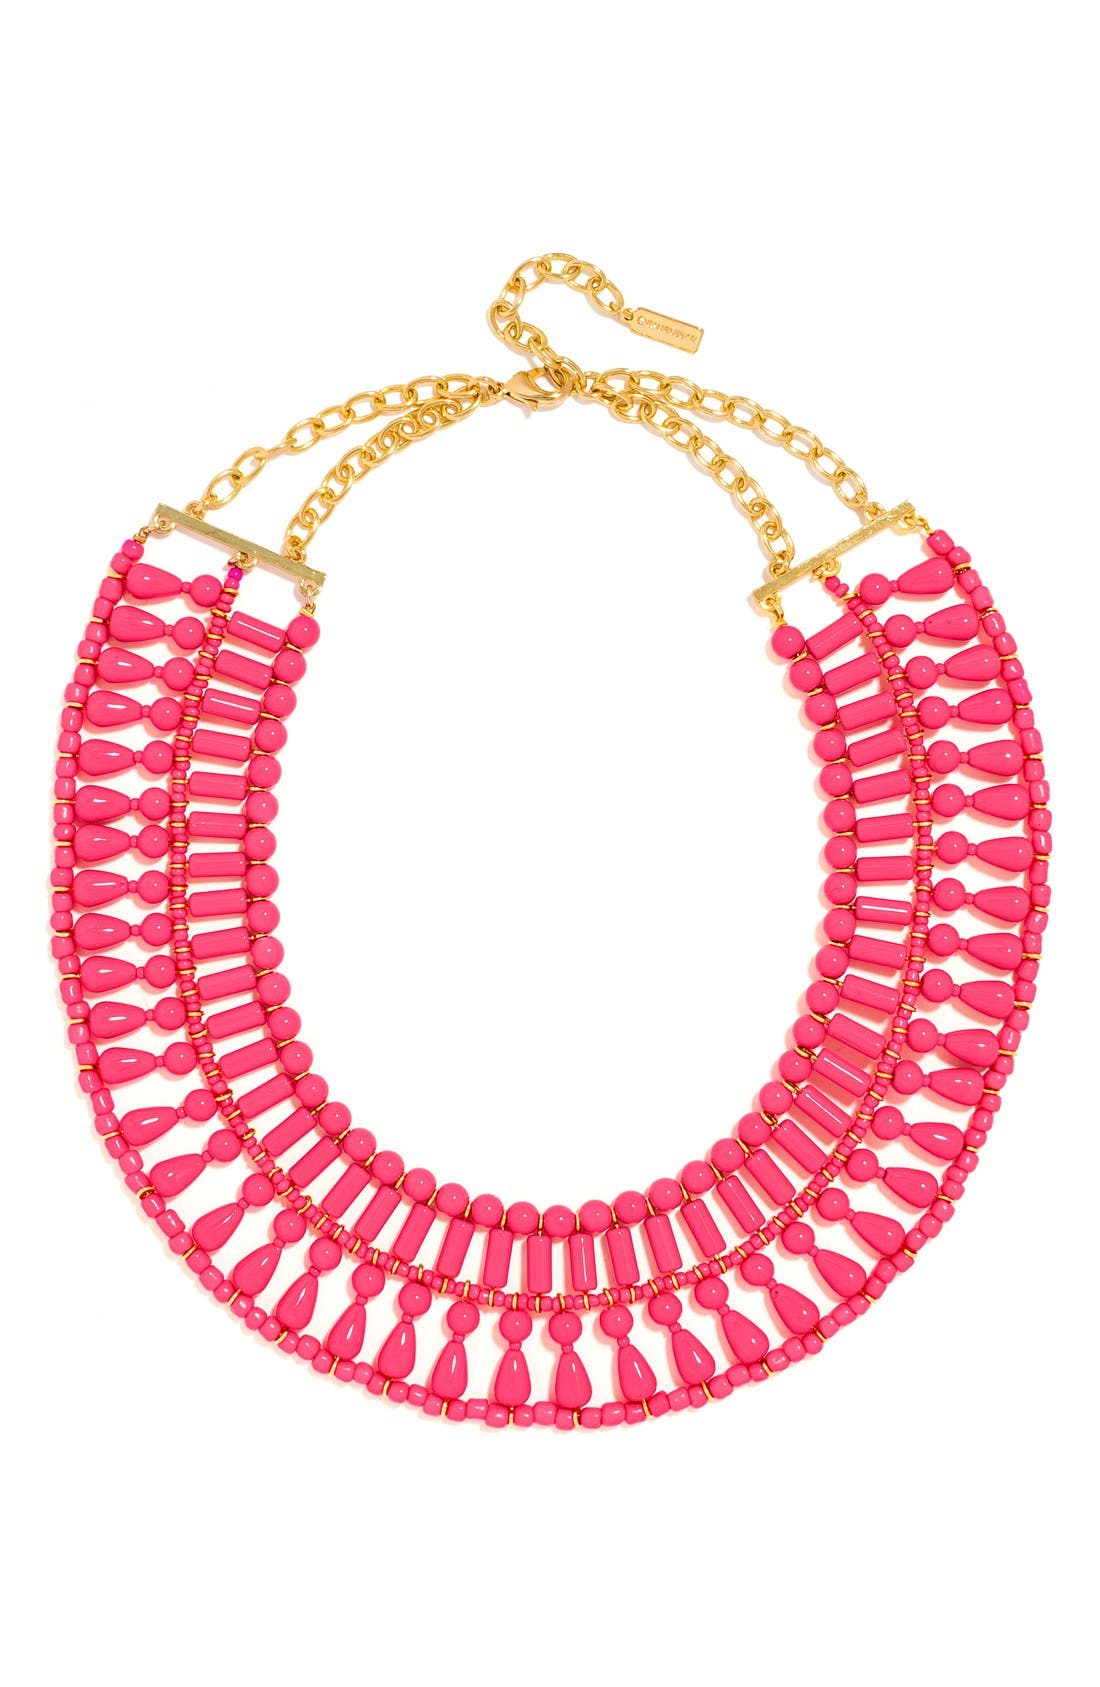 Alternate Image 1 Selected - BaubleBar 'Riviera' Collar Necklace